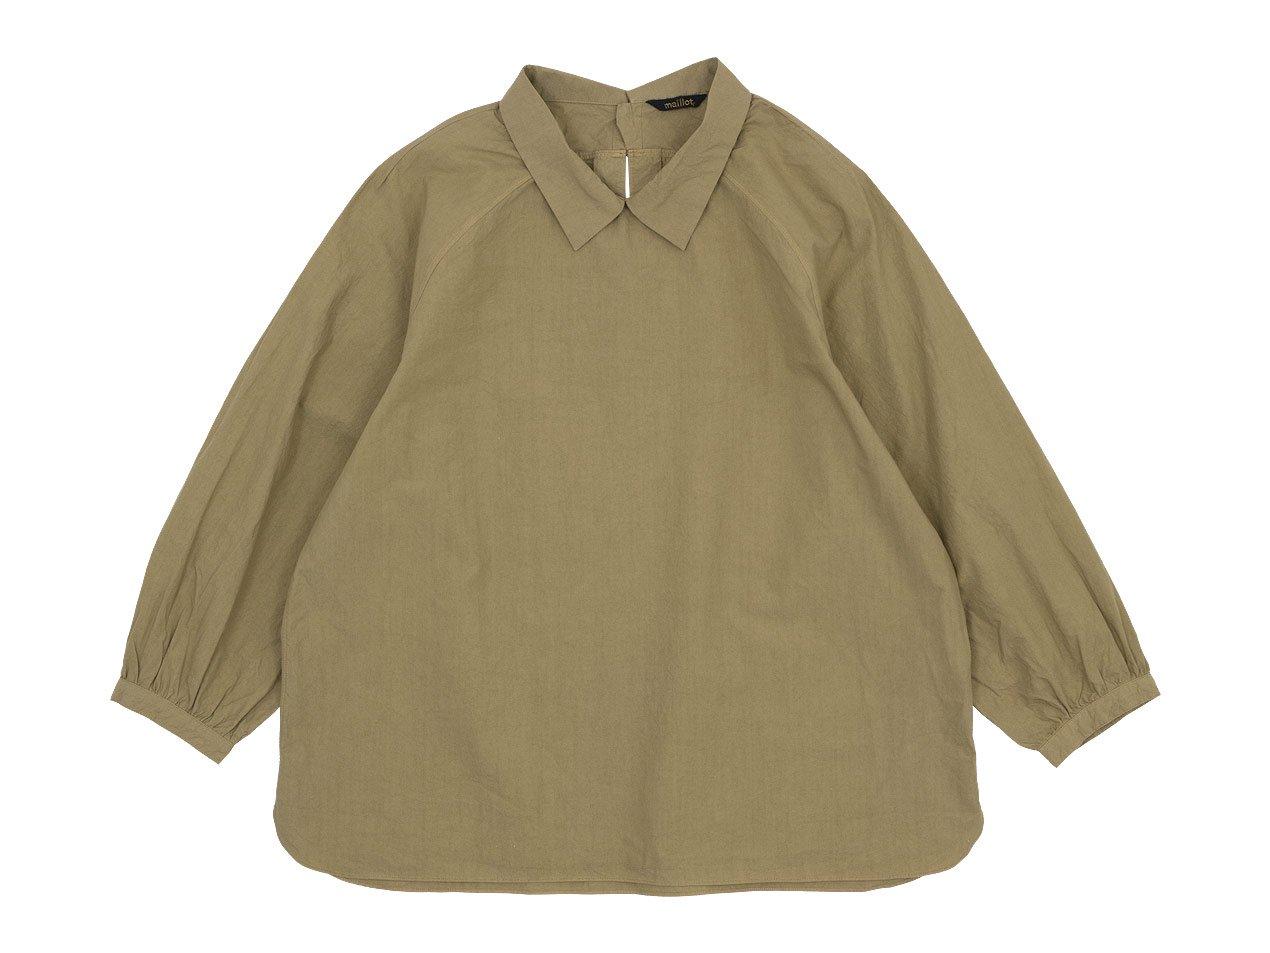 maillot mature rub cotton polo smock shirts BEIGE